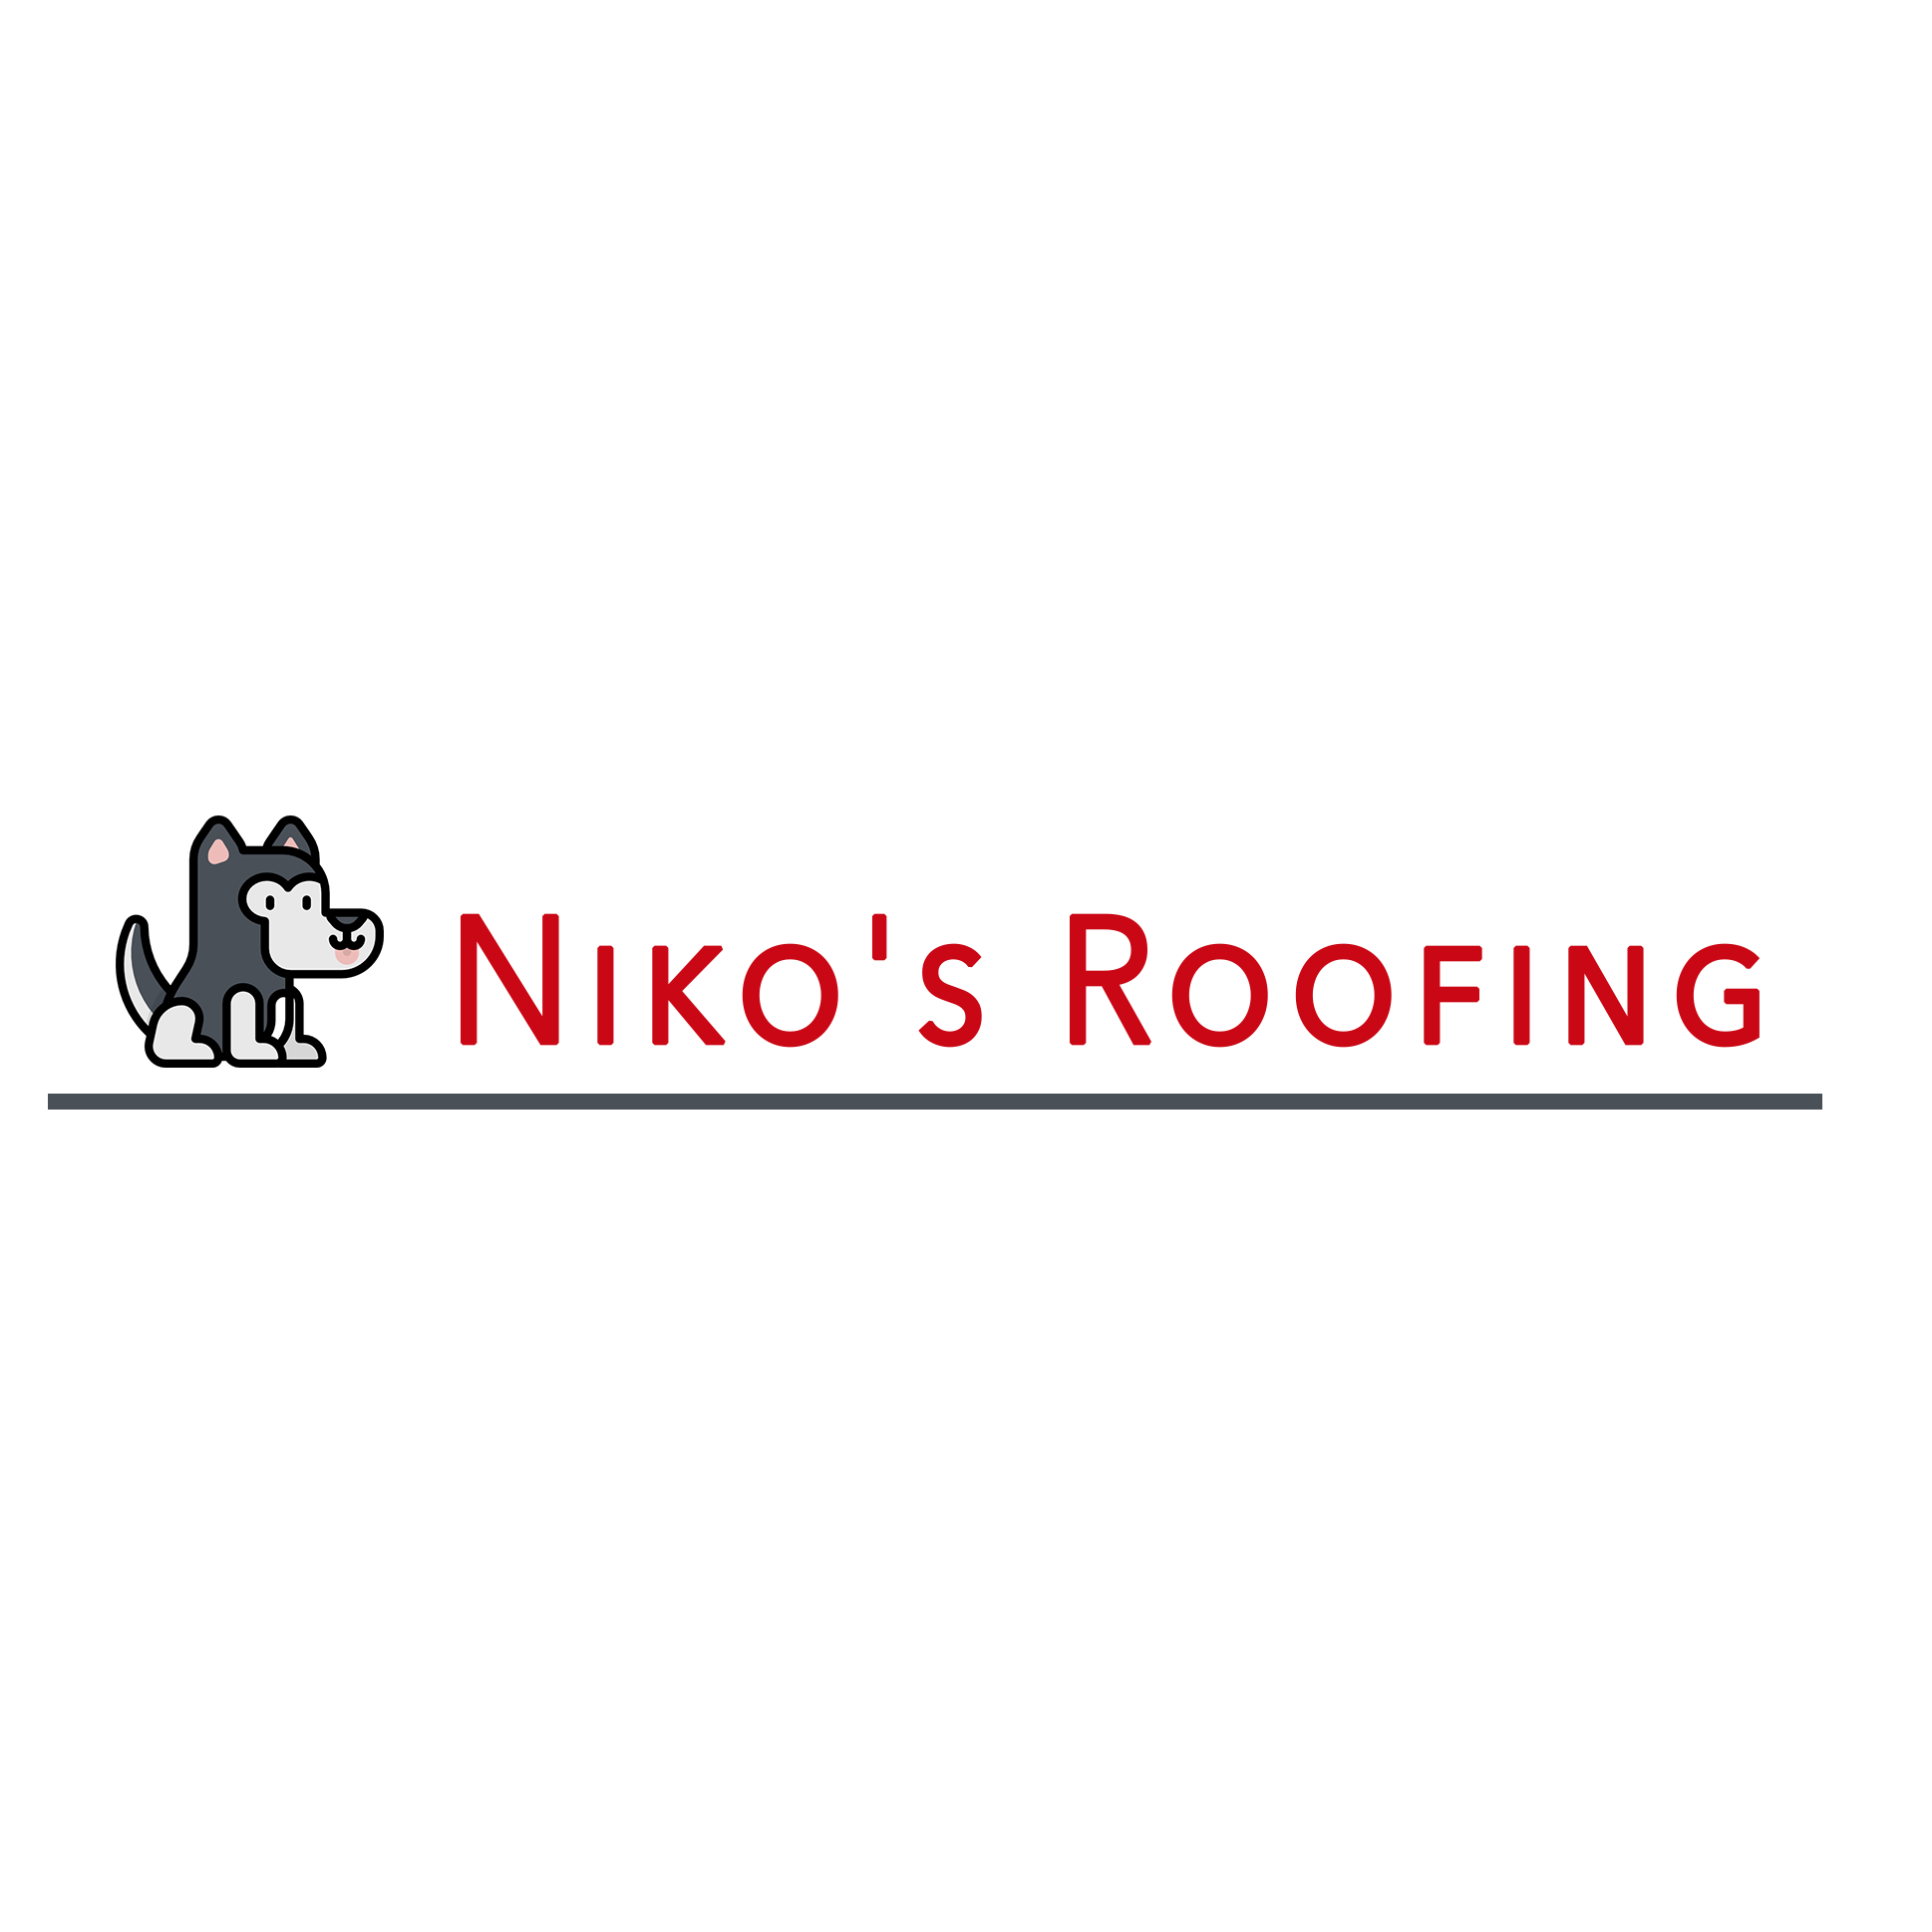 Niko's Roofing